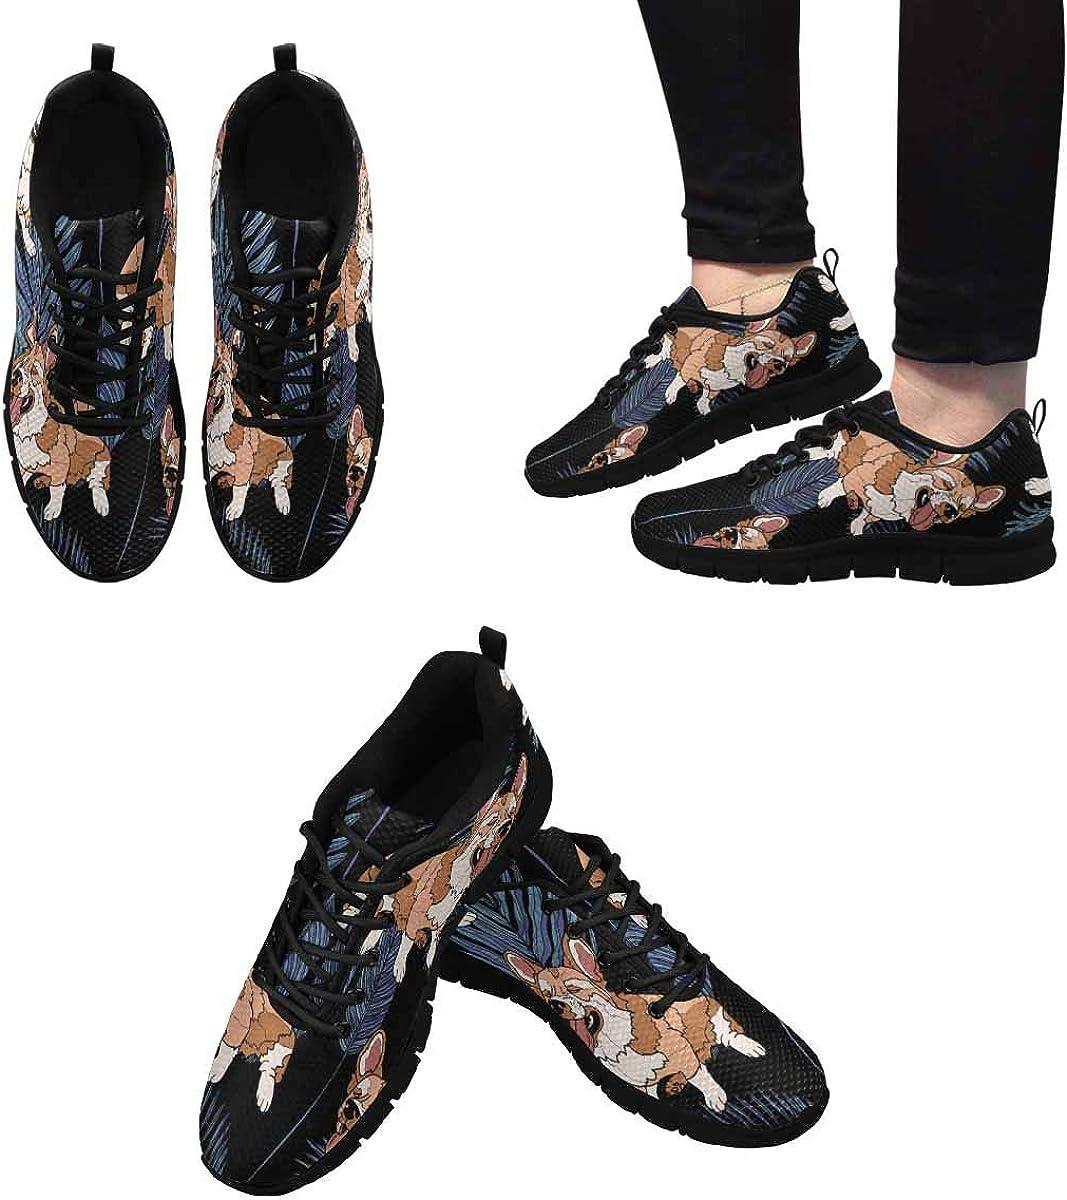 INTERESTPRINT Corgi Dog Women's Lace Up Breathable Non Slip Sneaker